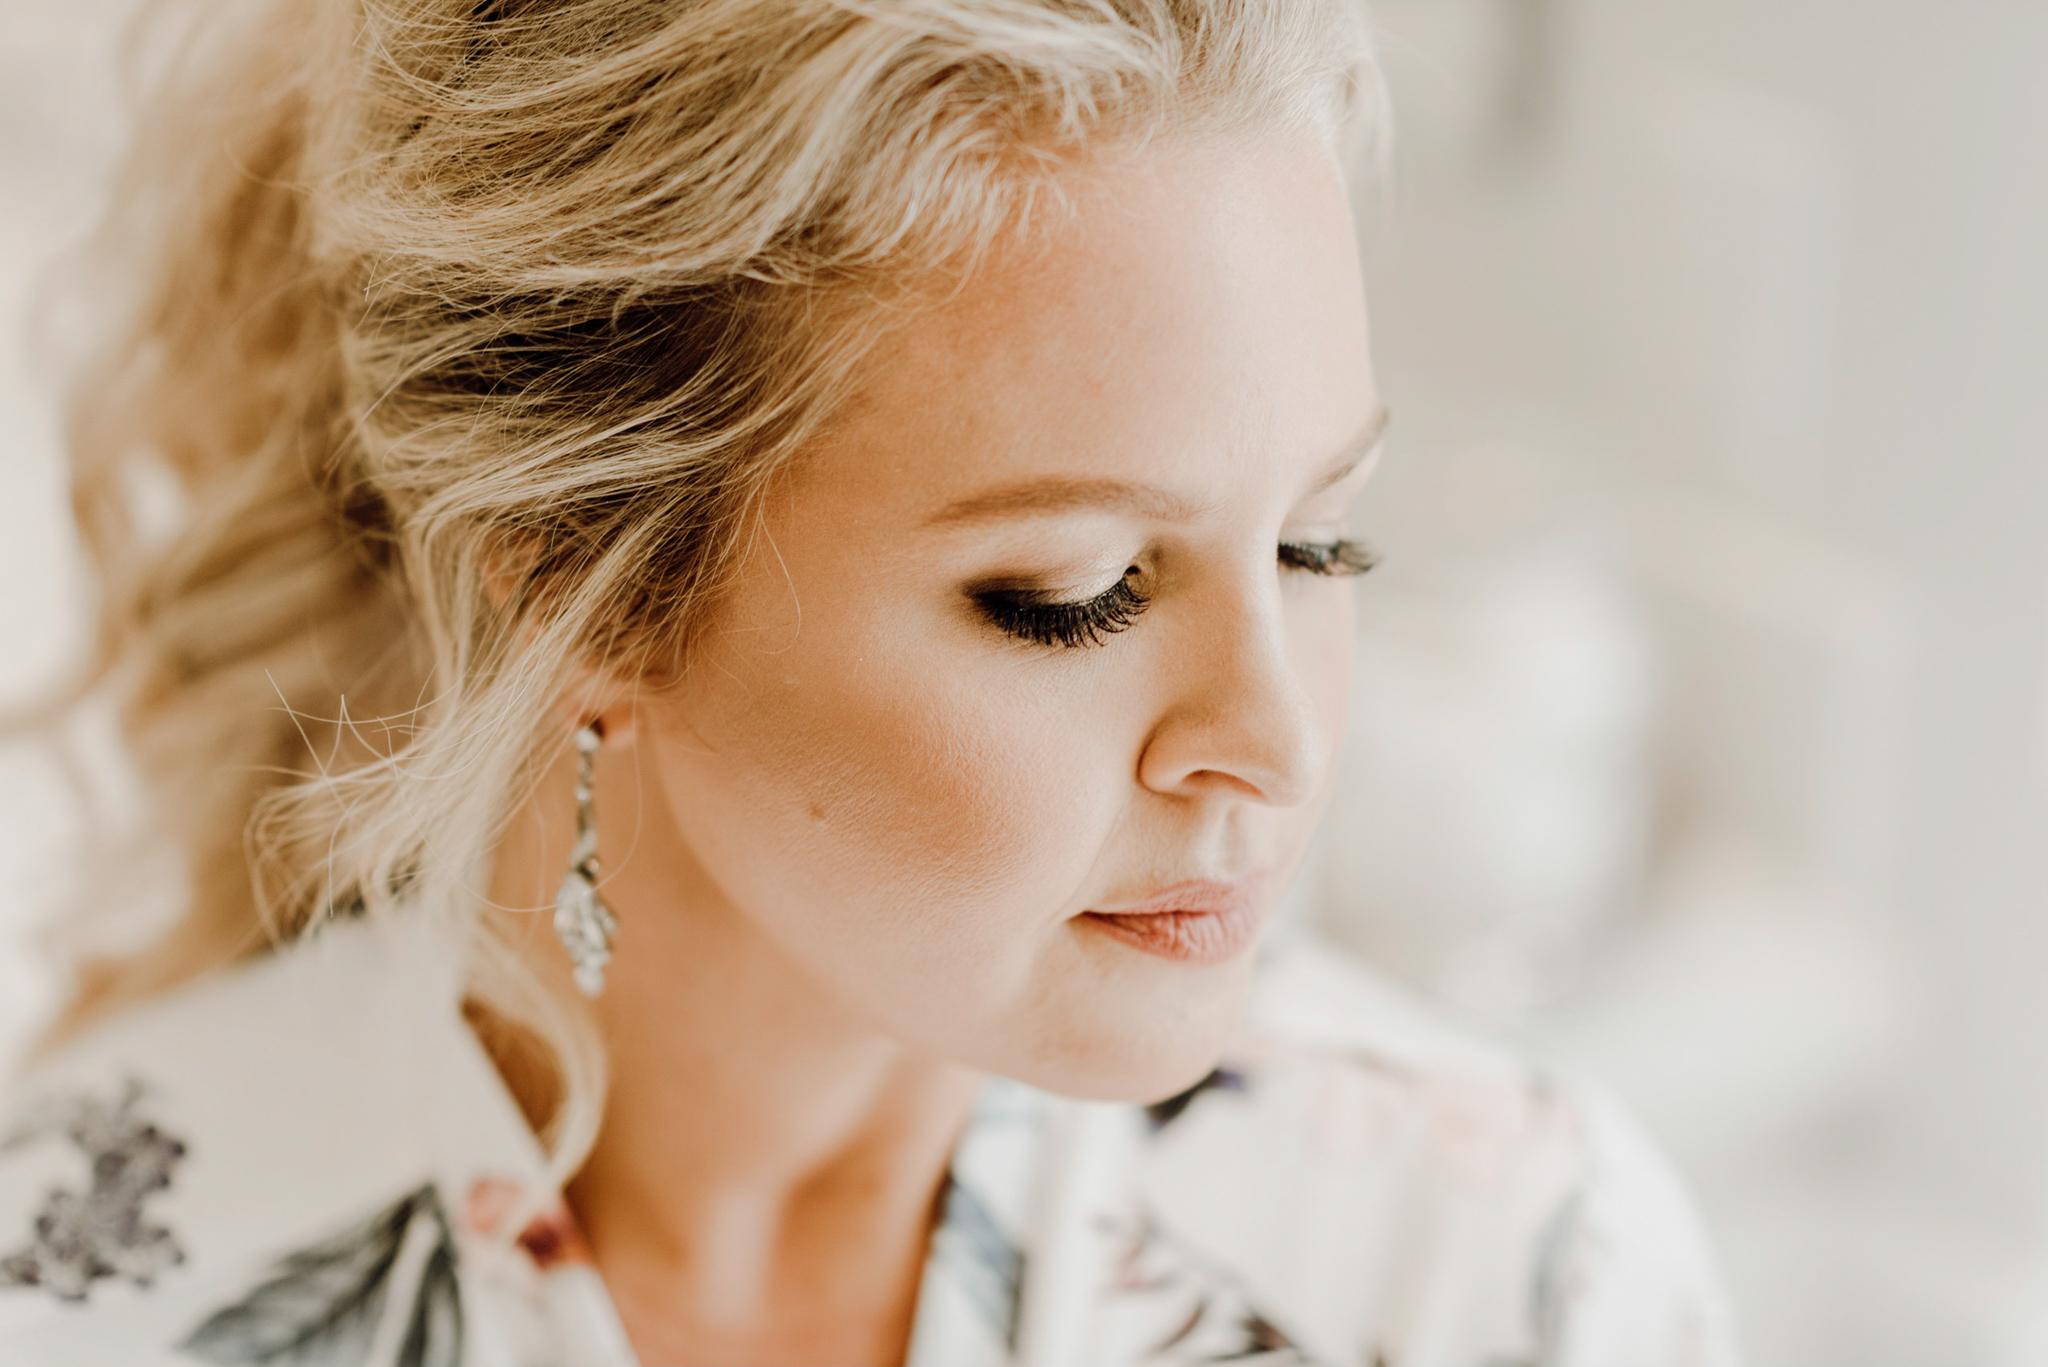 Houston Wedding Photographer-Intimate Texas Backyard Wedding- Houston Wedding Photographer -Kristen Giles Photography-15.jpg